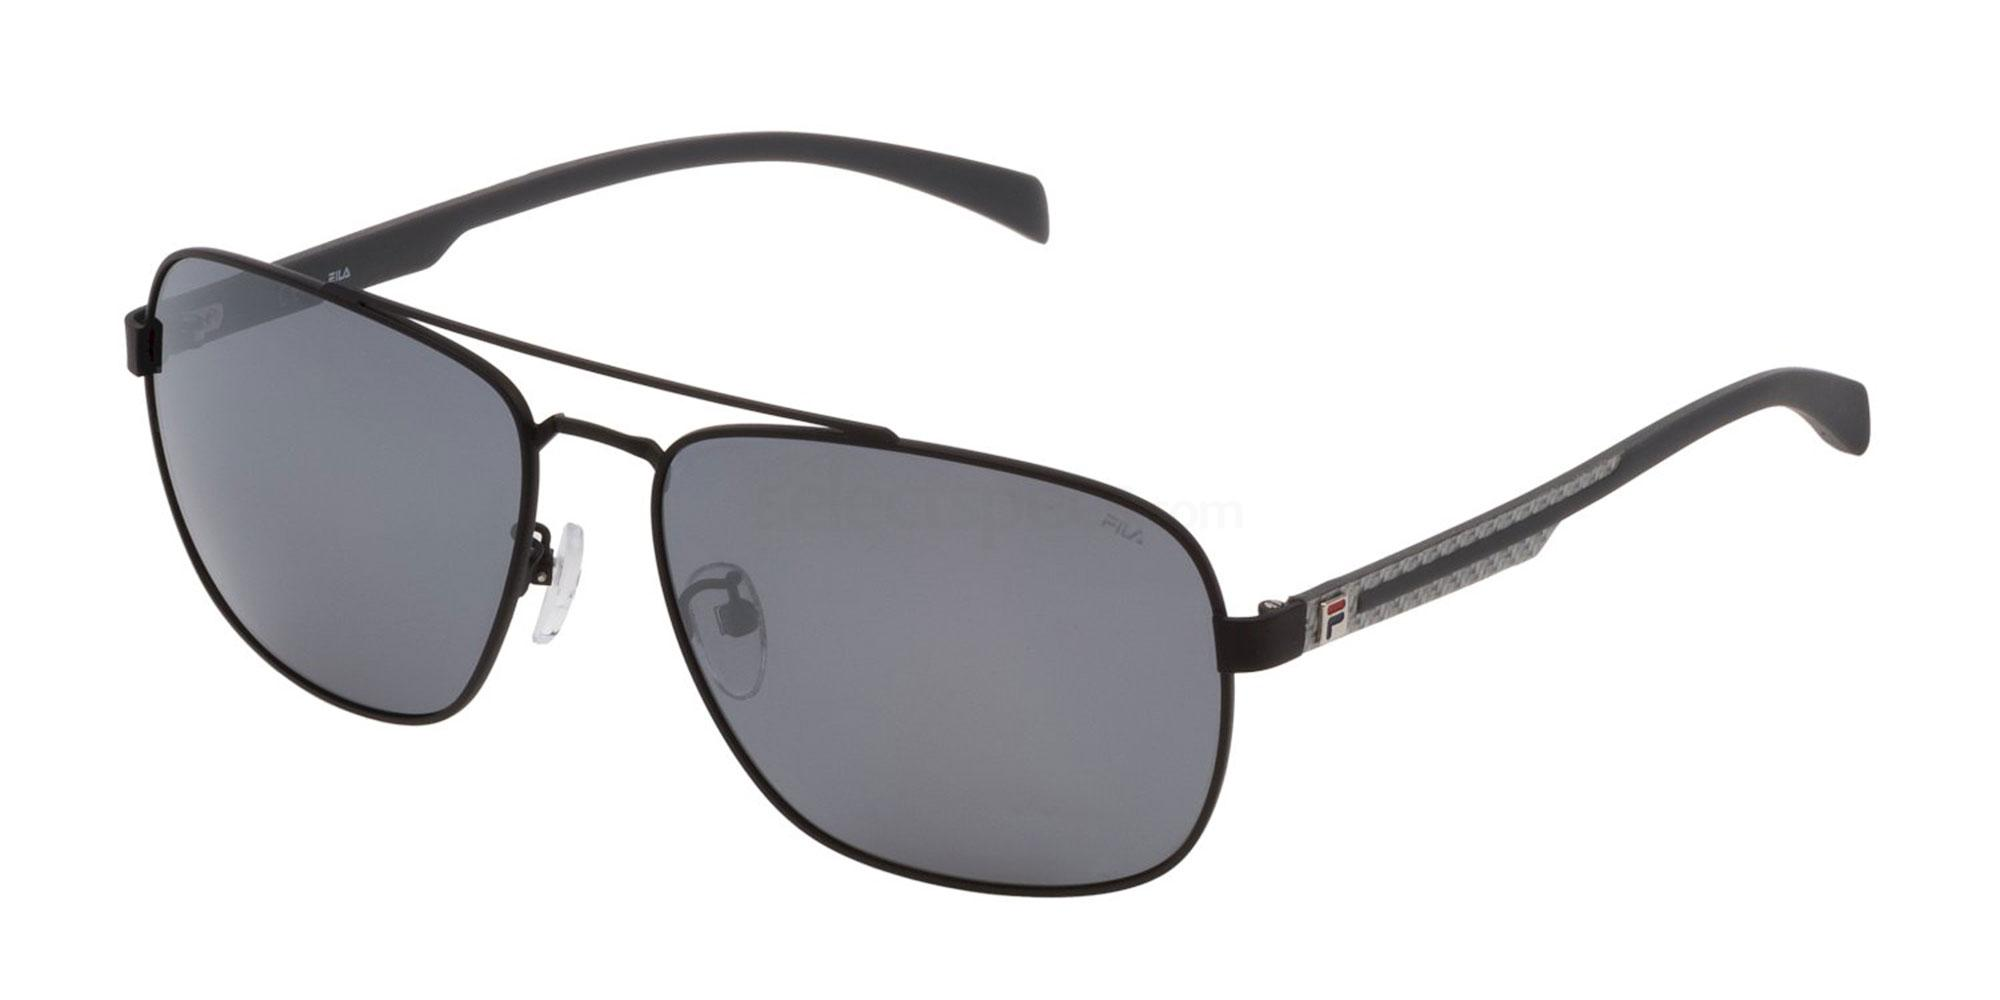 531P SF8493 Sunglasses, Fila